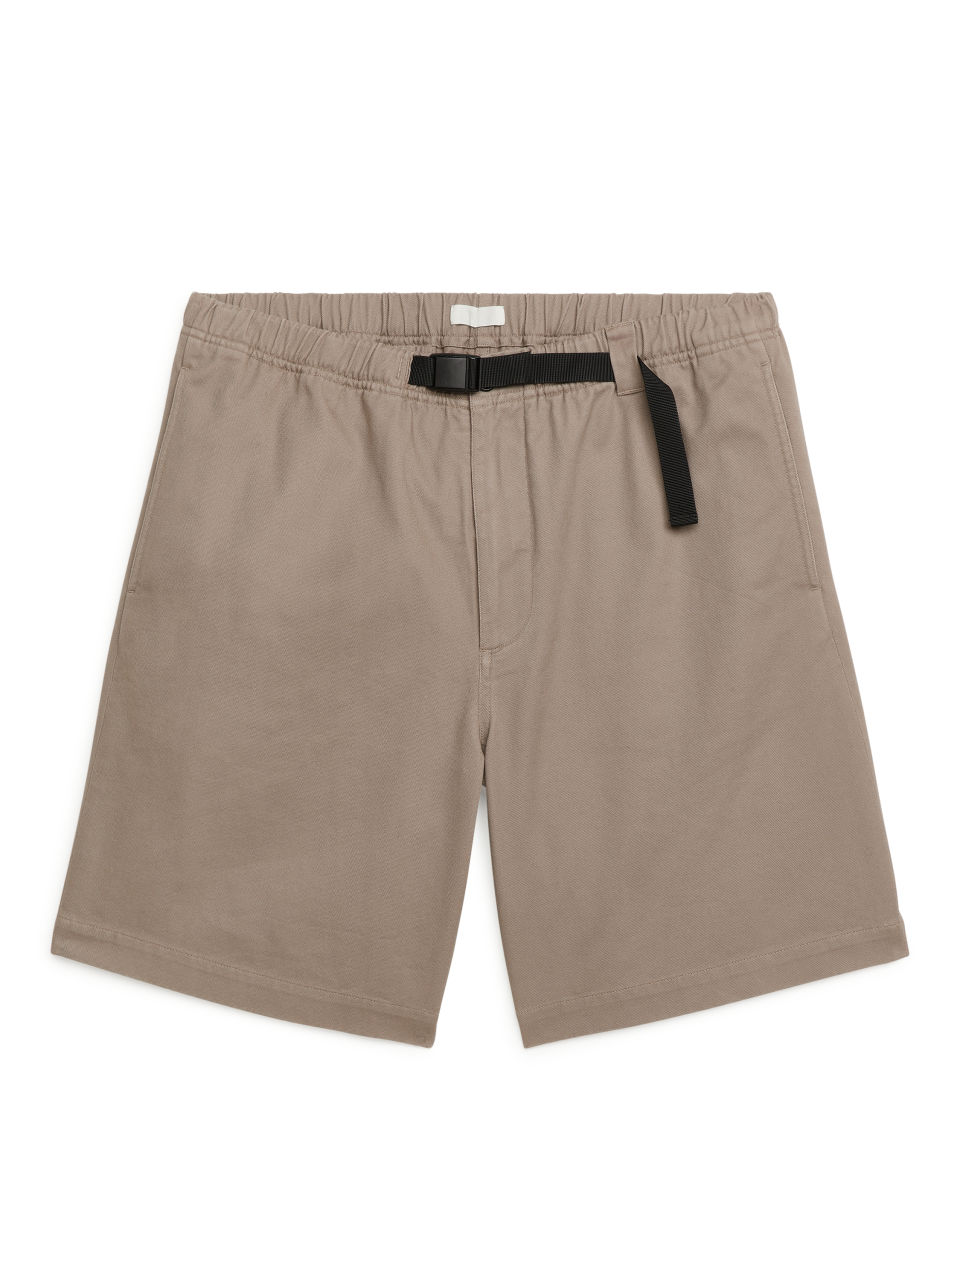 Strap-Detail Cotton Twill Shorts - Brown